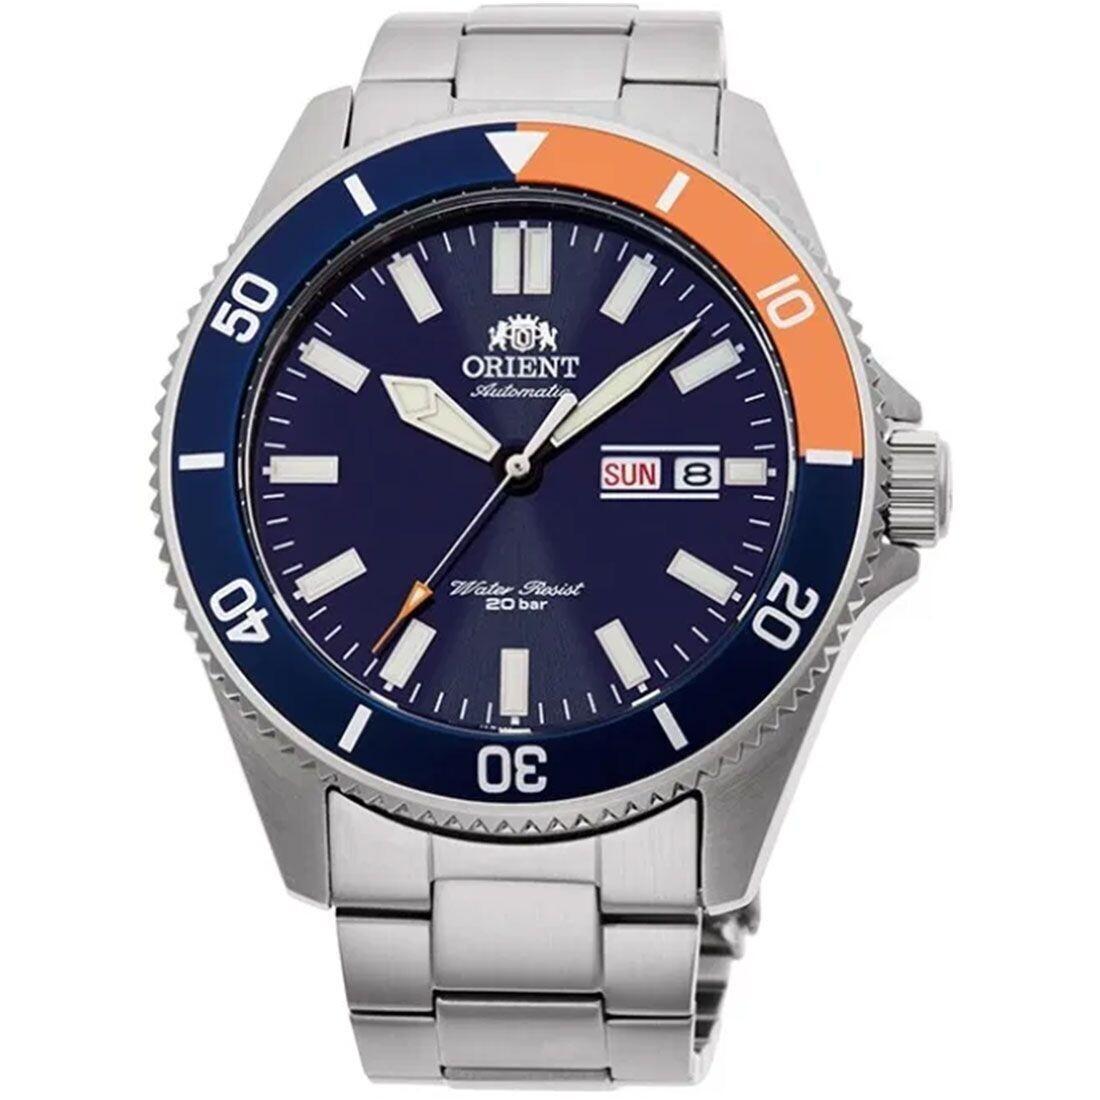 Reloj Automático hombre buceo Orient Kanno RA-AA0913L dial azul 44mm correa acero 200m WR